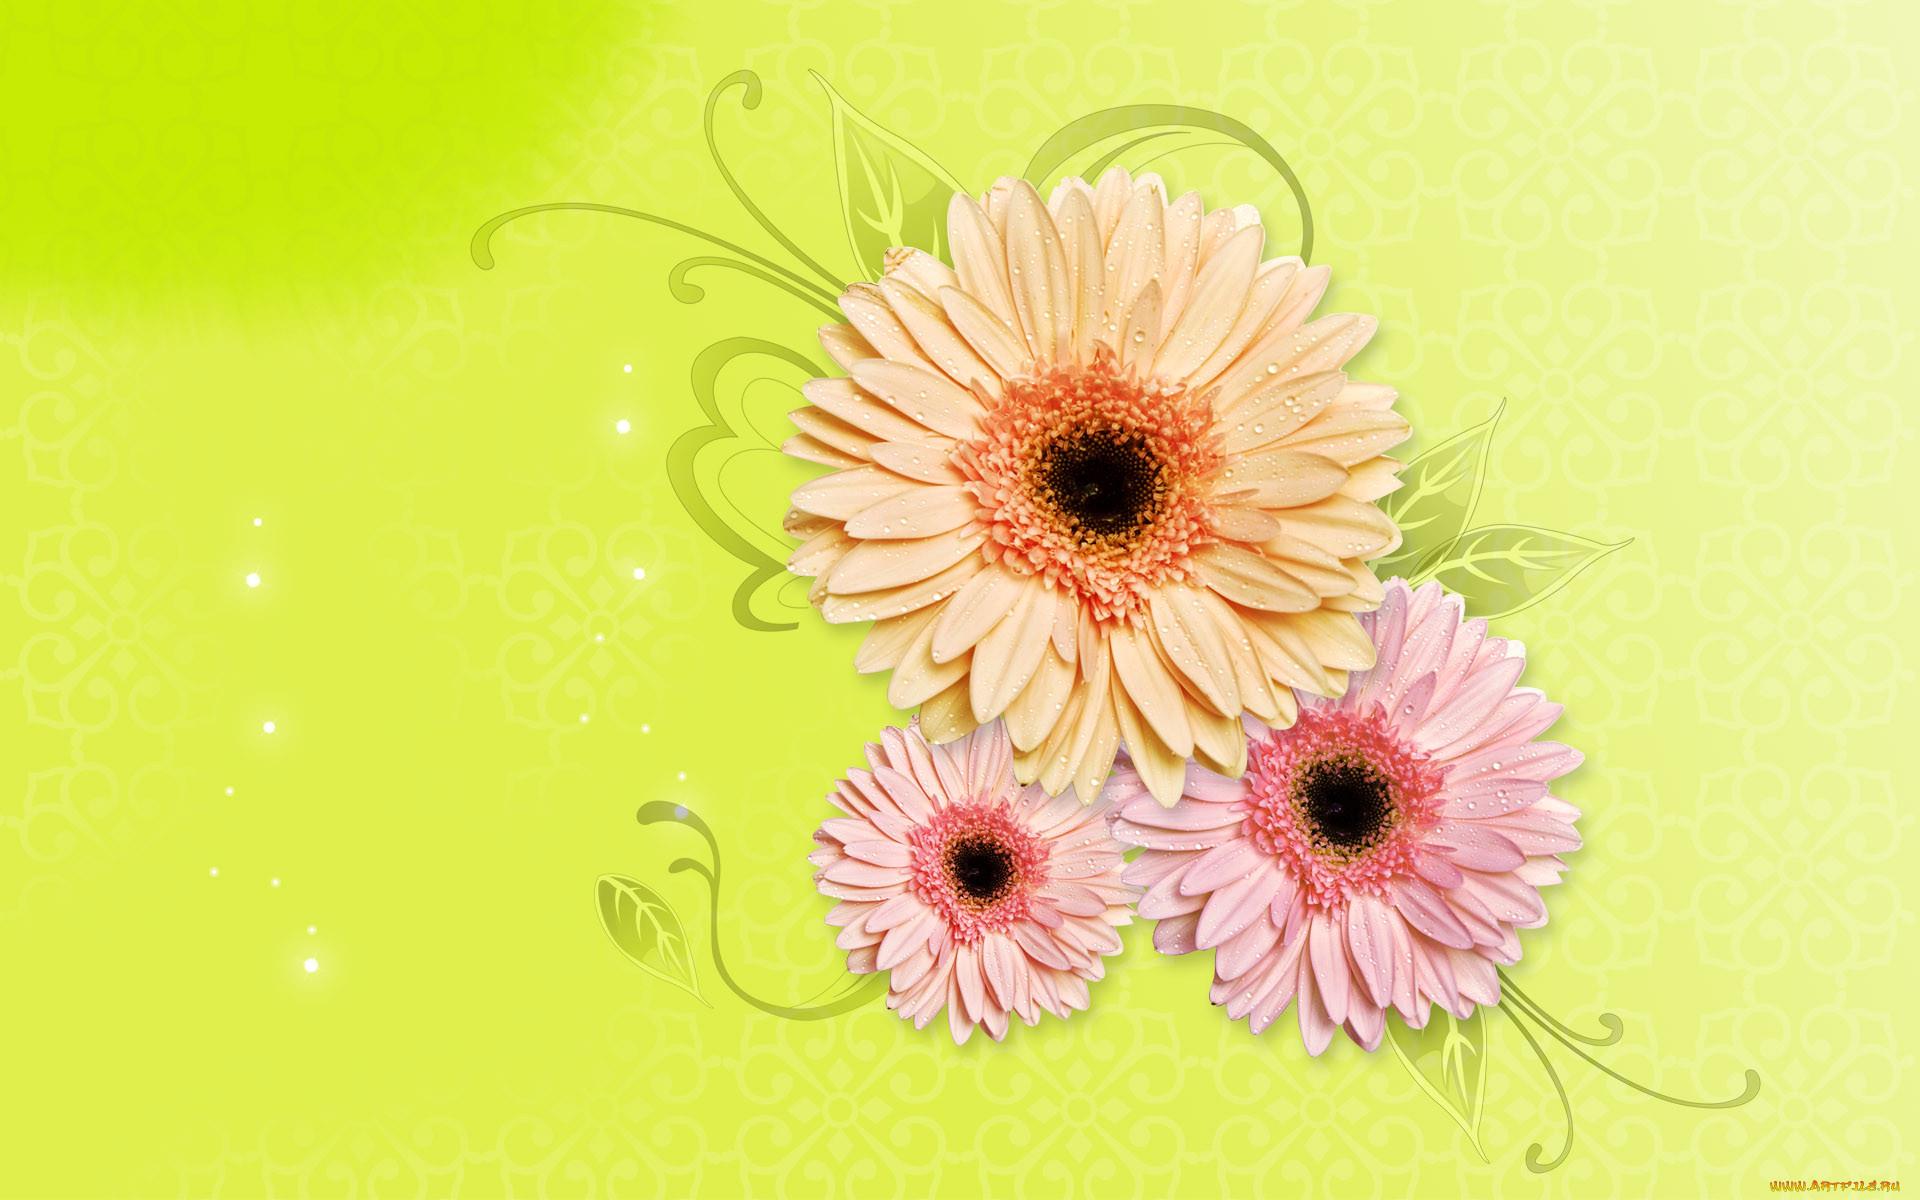 Цветочек картинка на открытку